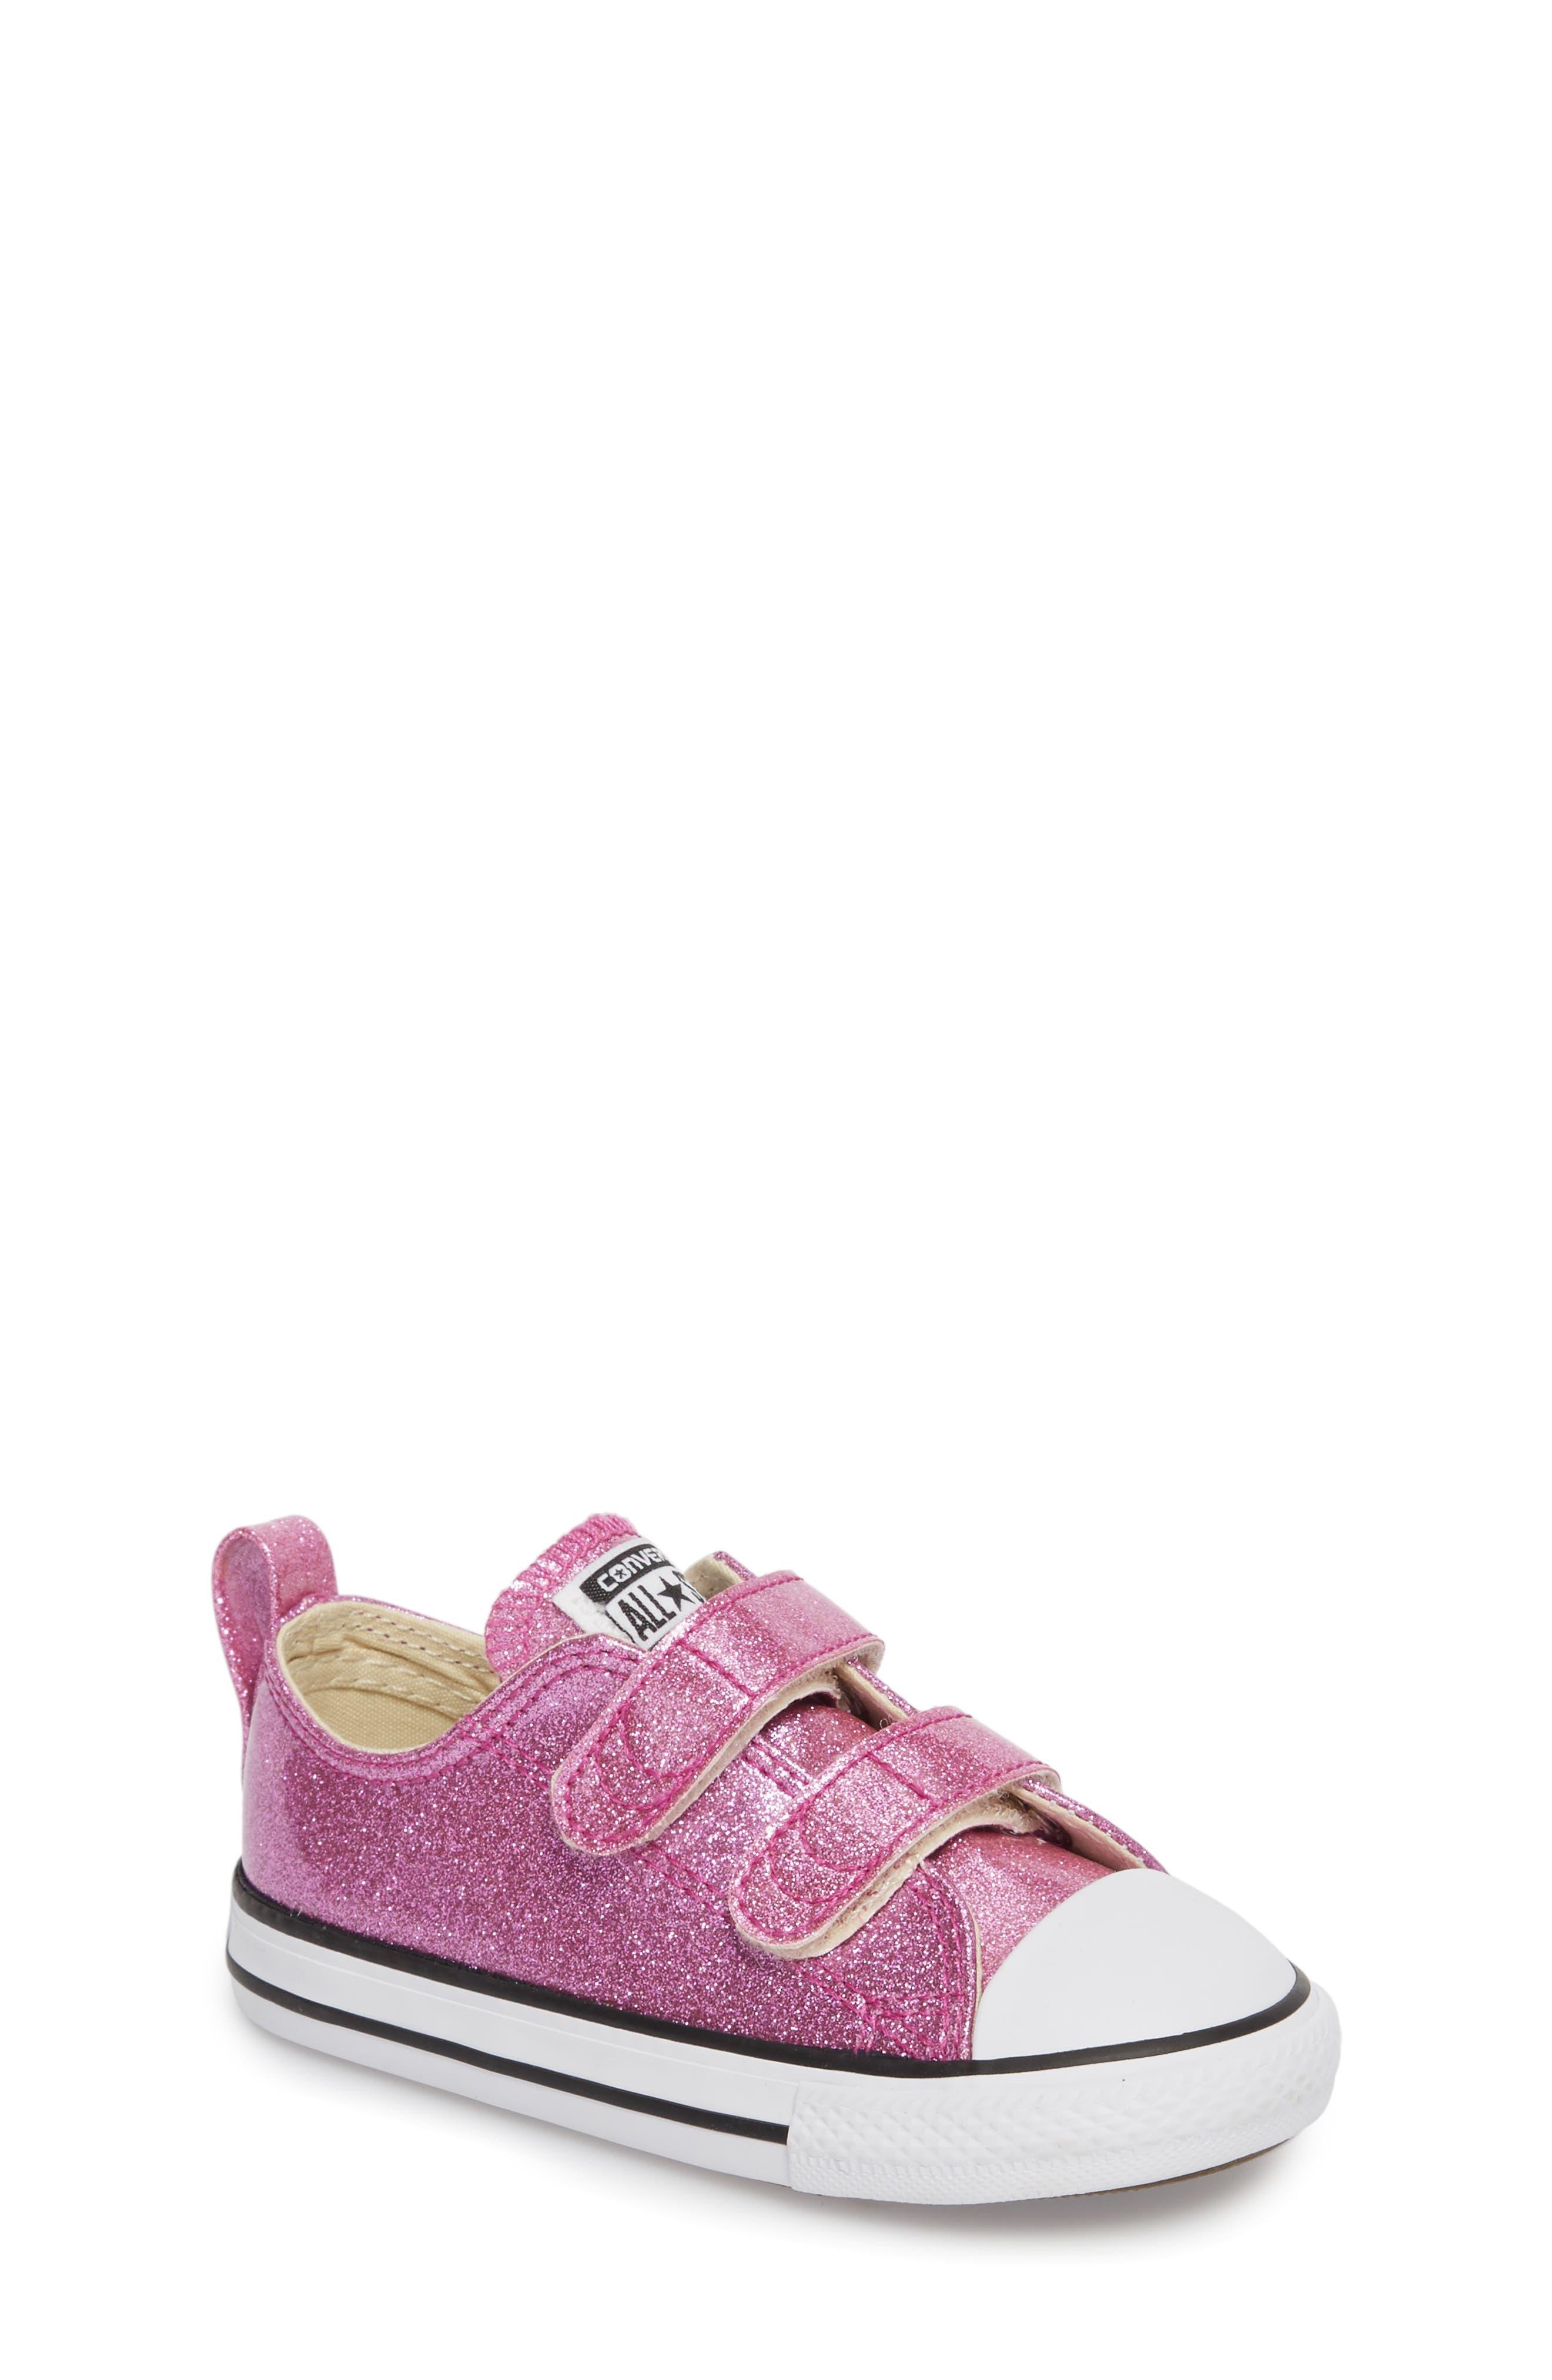 All Star<sup>®</sup> Seasonal Glitter Sneaker,                             Main thumbnail 1, color,                             500